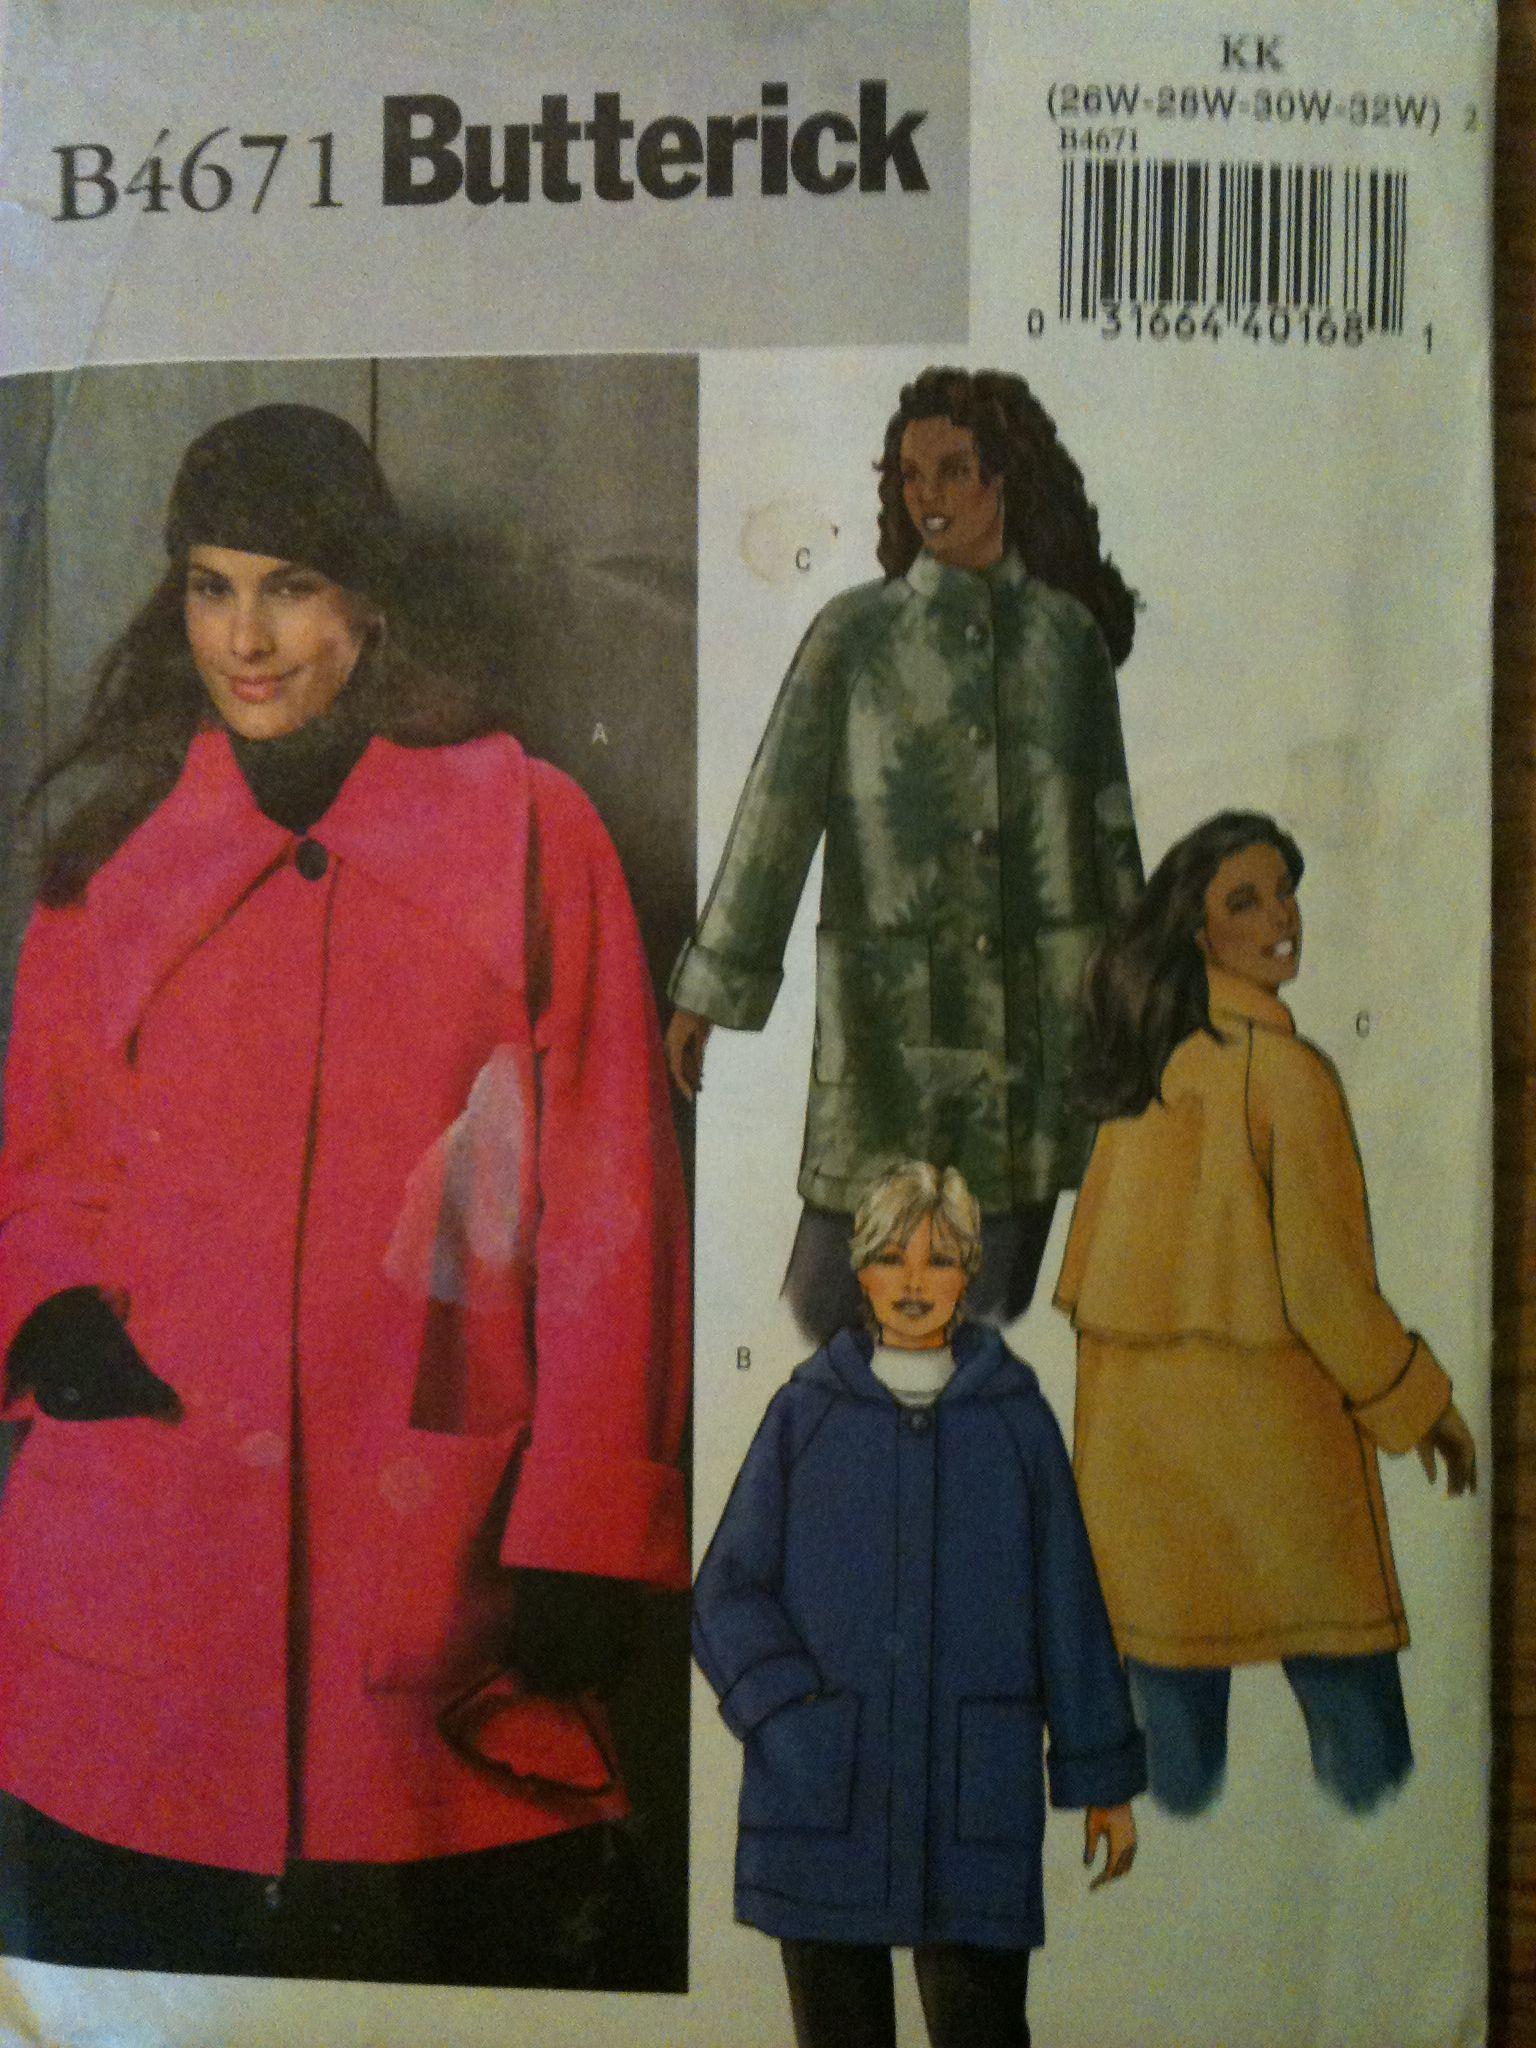 Butterick #4671. Woman's Coat, three styles, size 26W-32W. Copyright 2005.